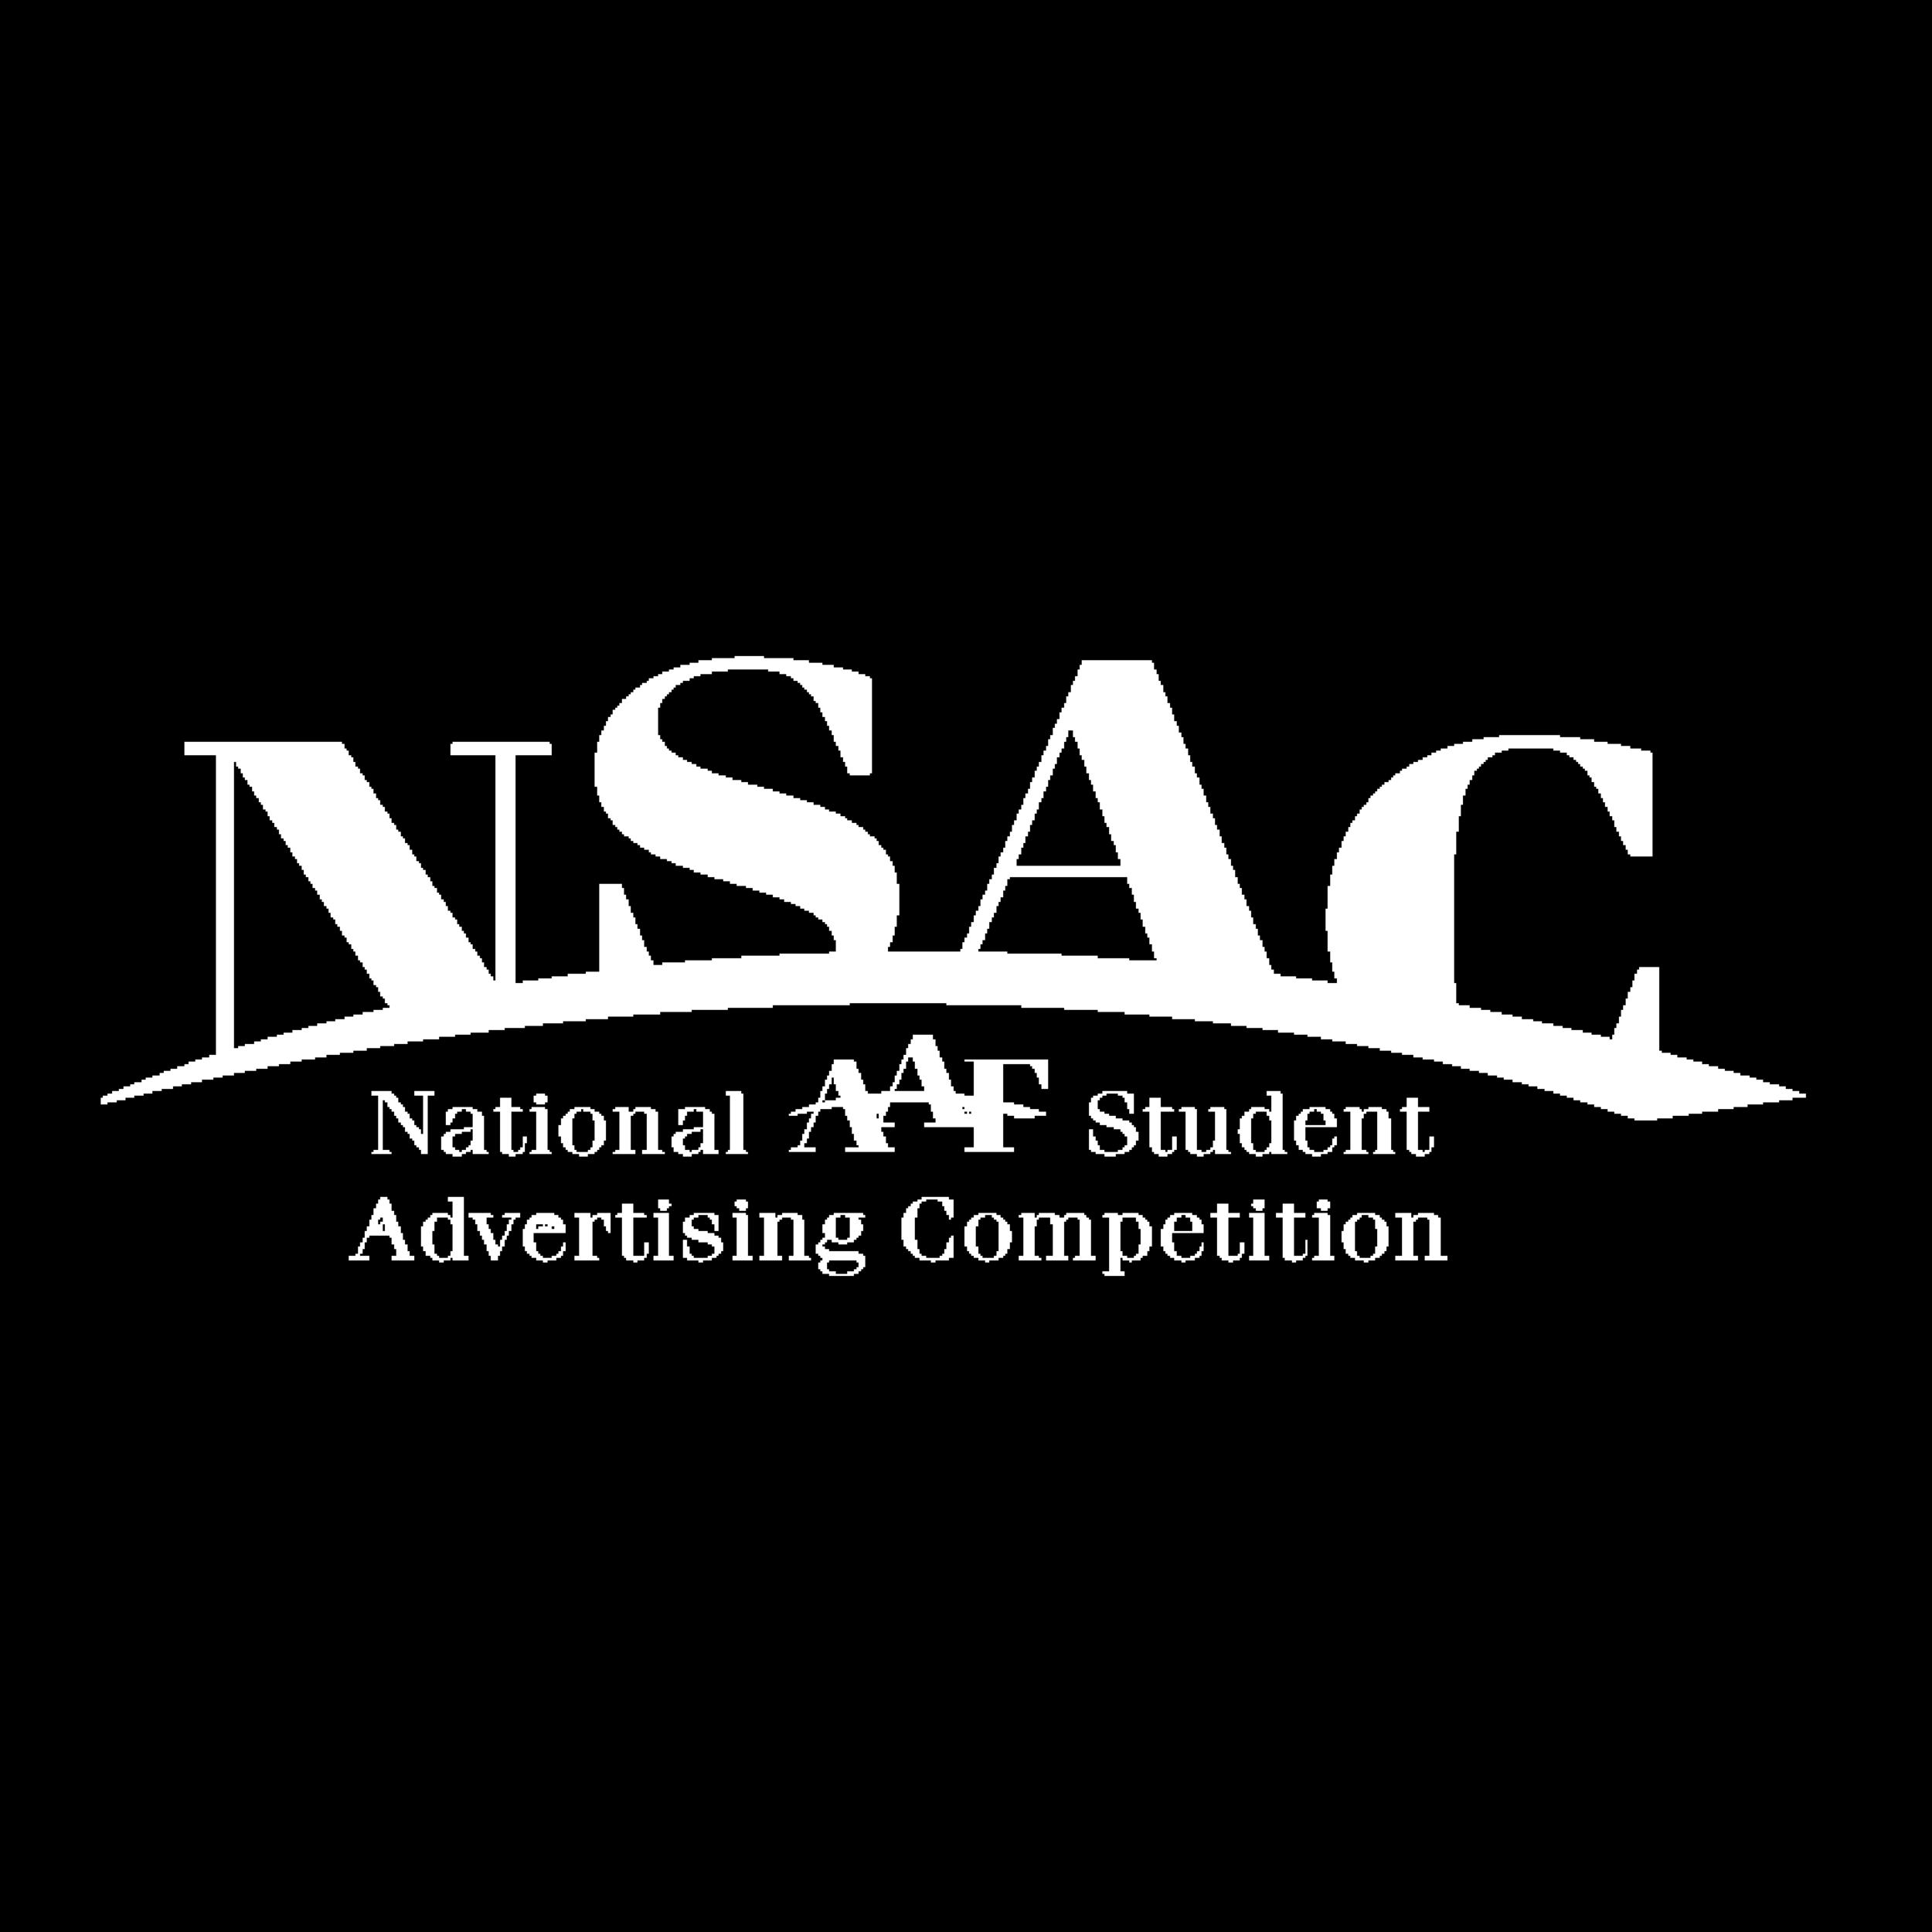 Copy of NSAC circle logo.png